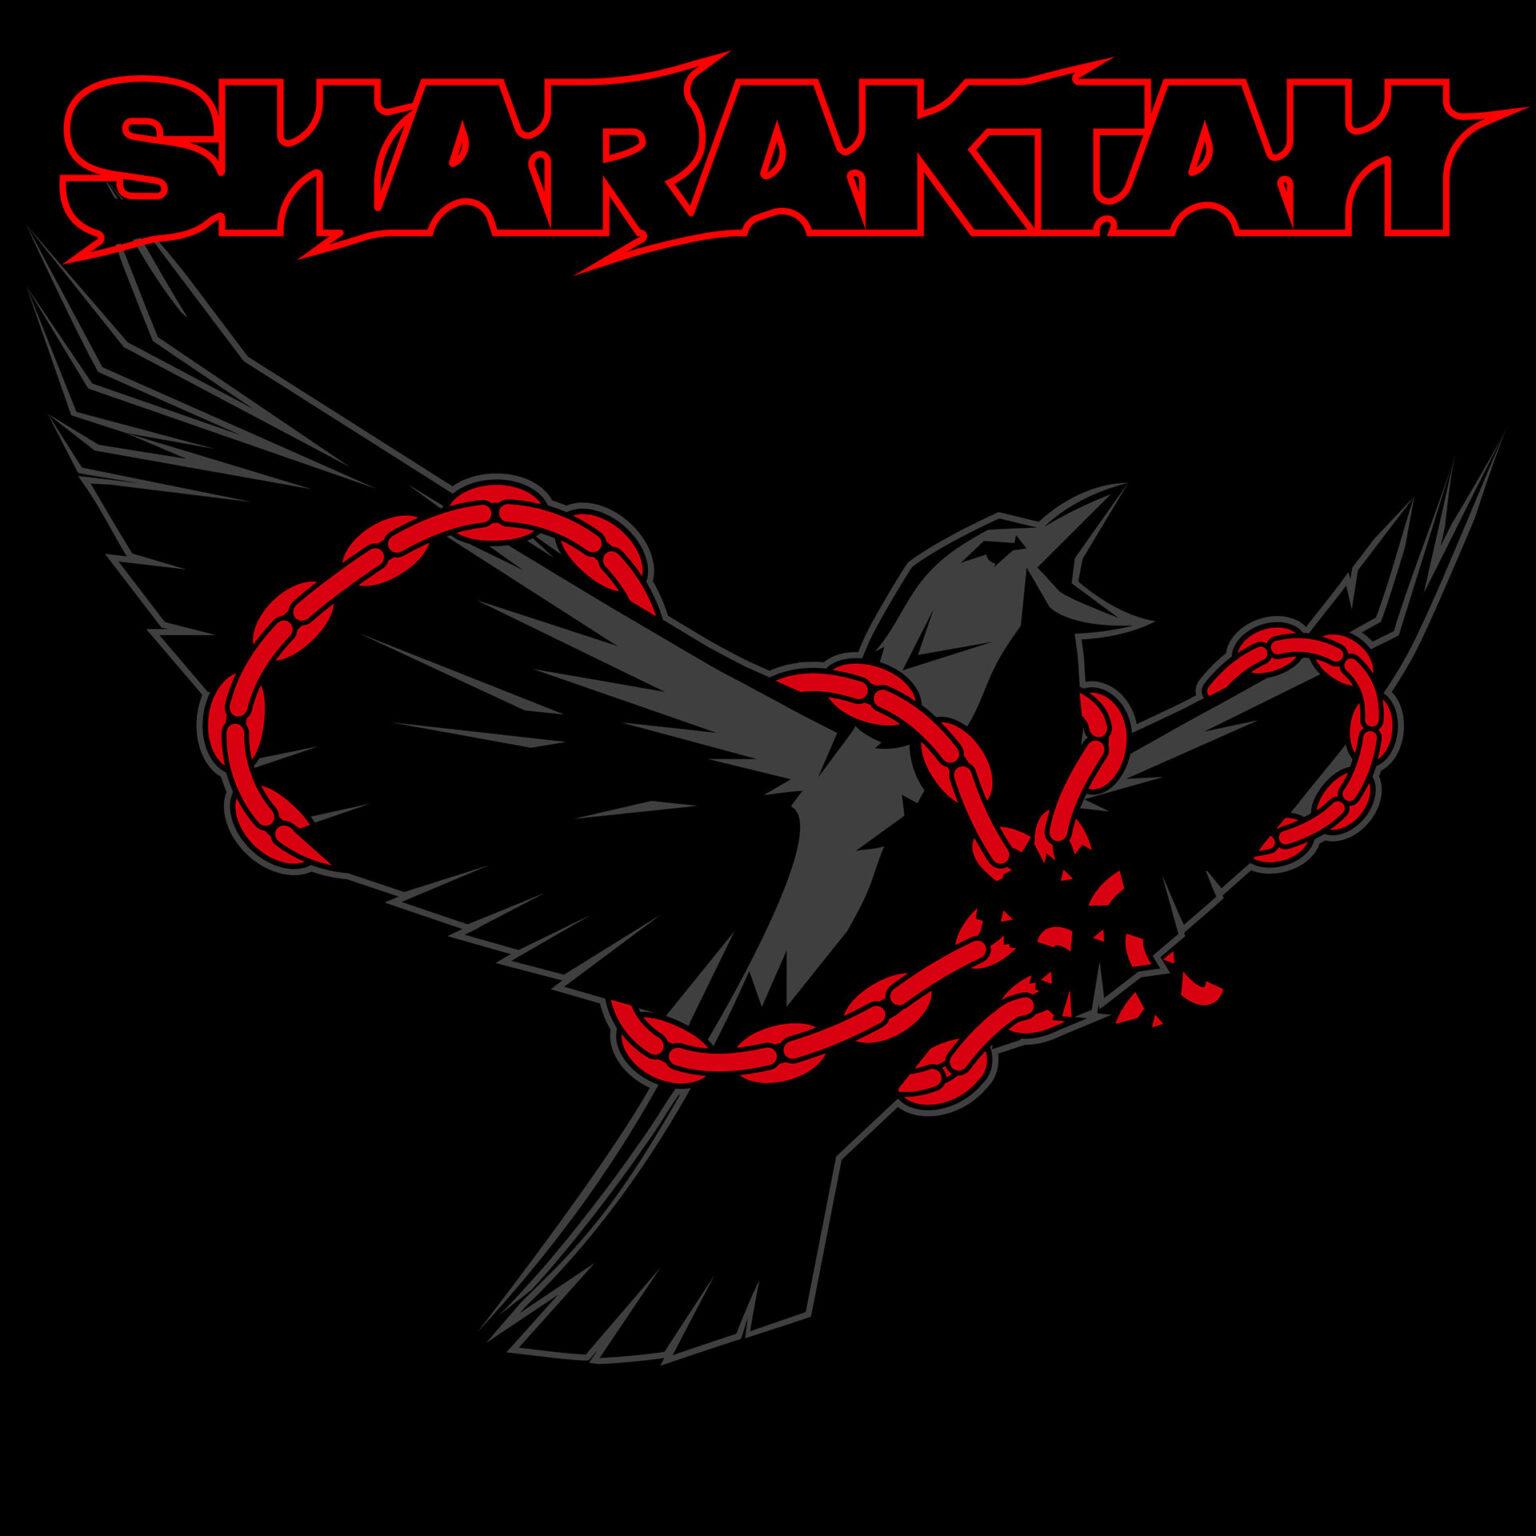 Sharaktah - EP - s'läuft! Radio-Promotion